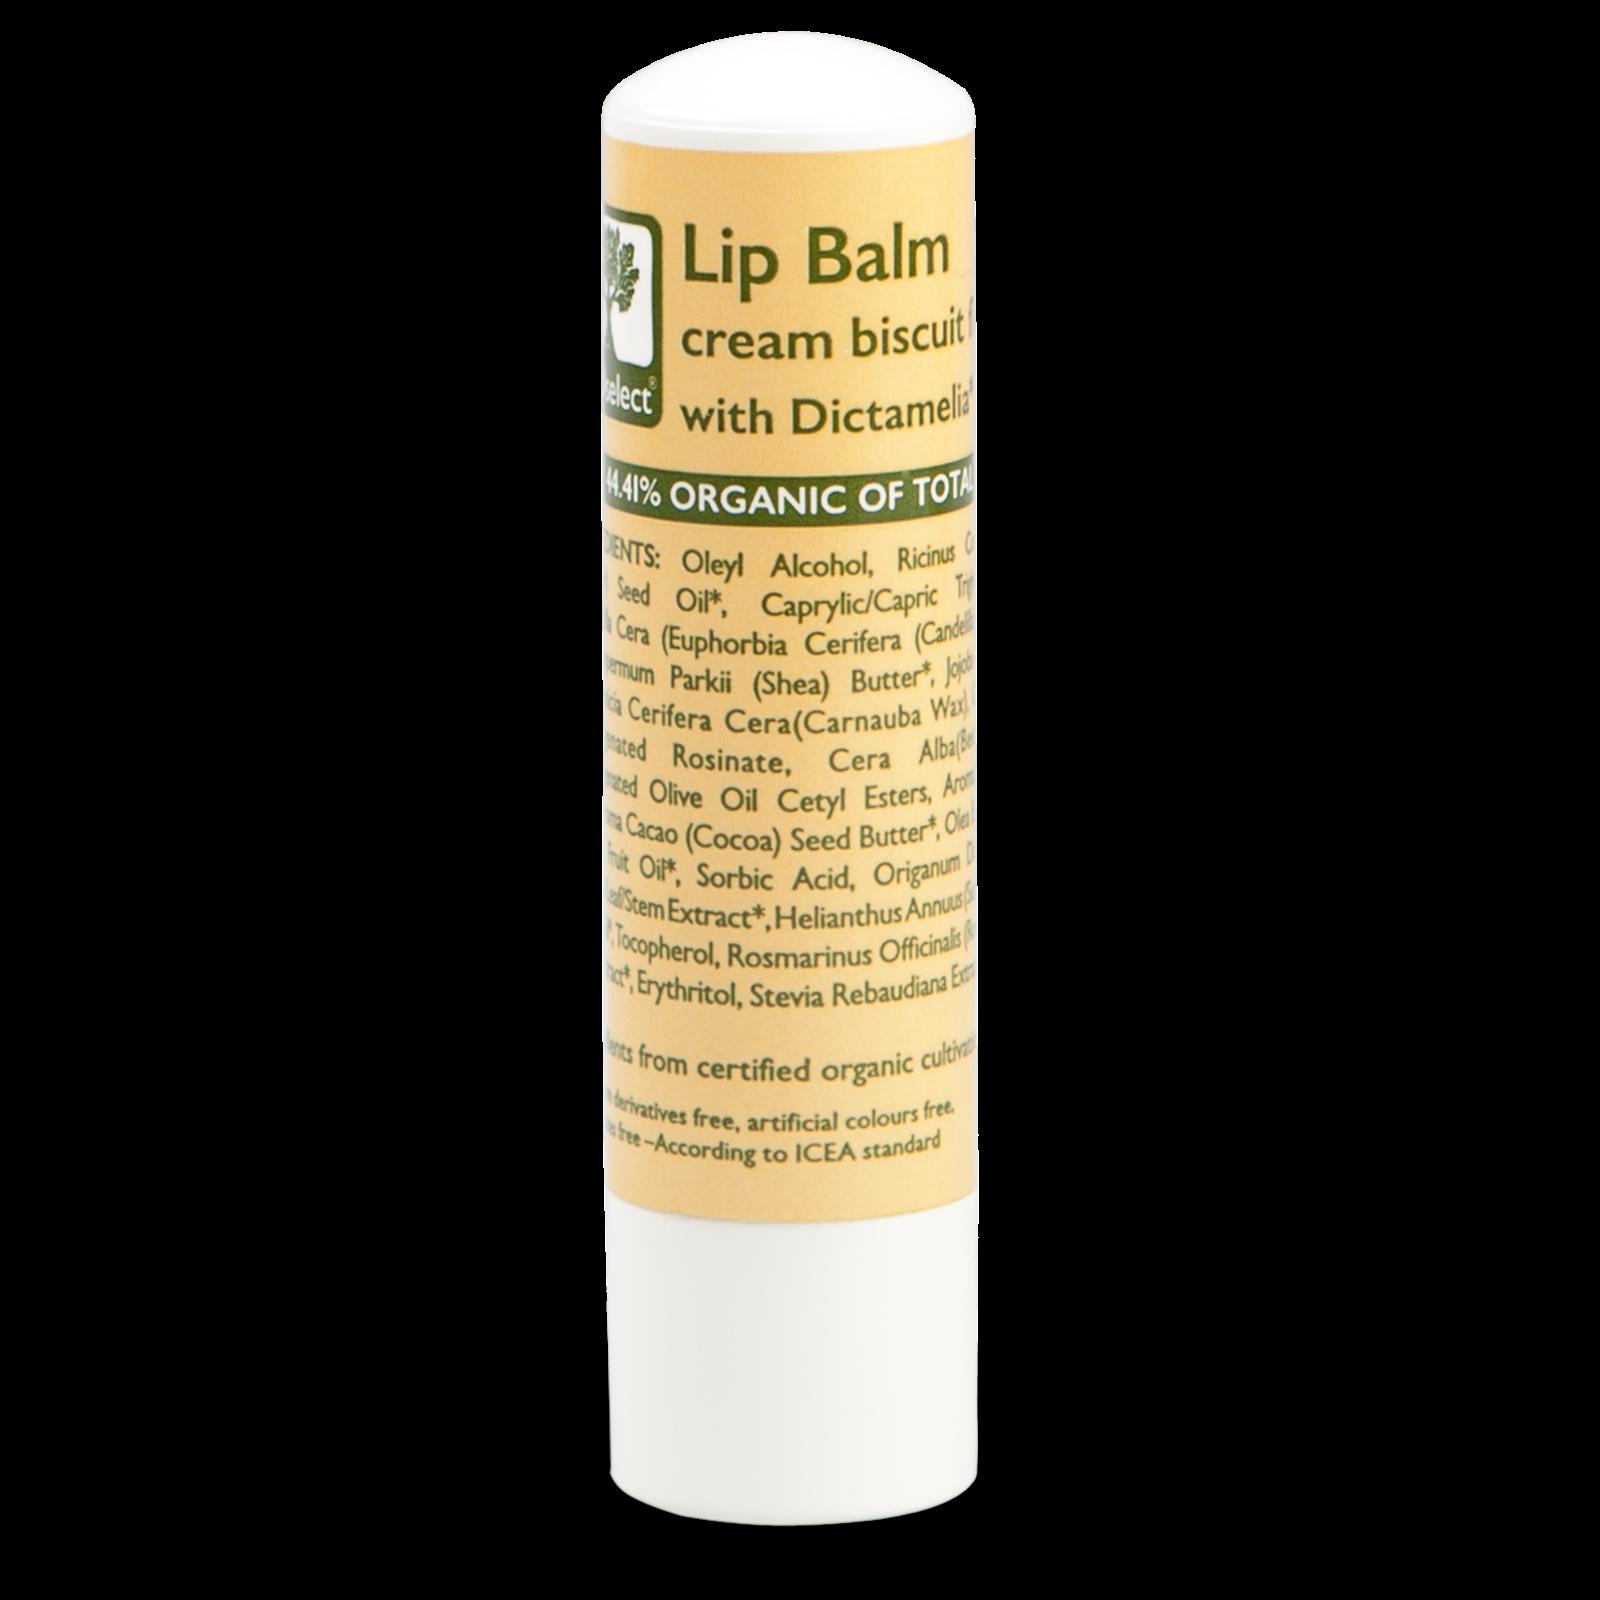 Bioselect Lip Balm cream biscuit flavor